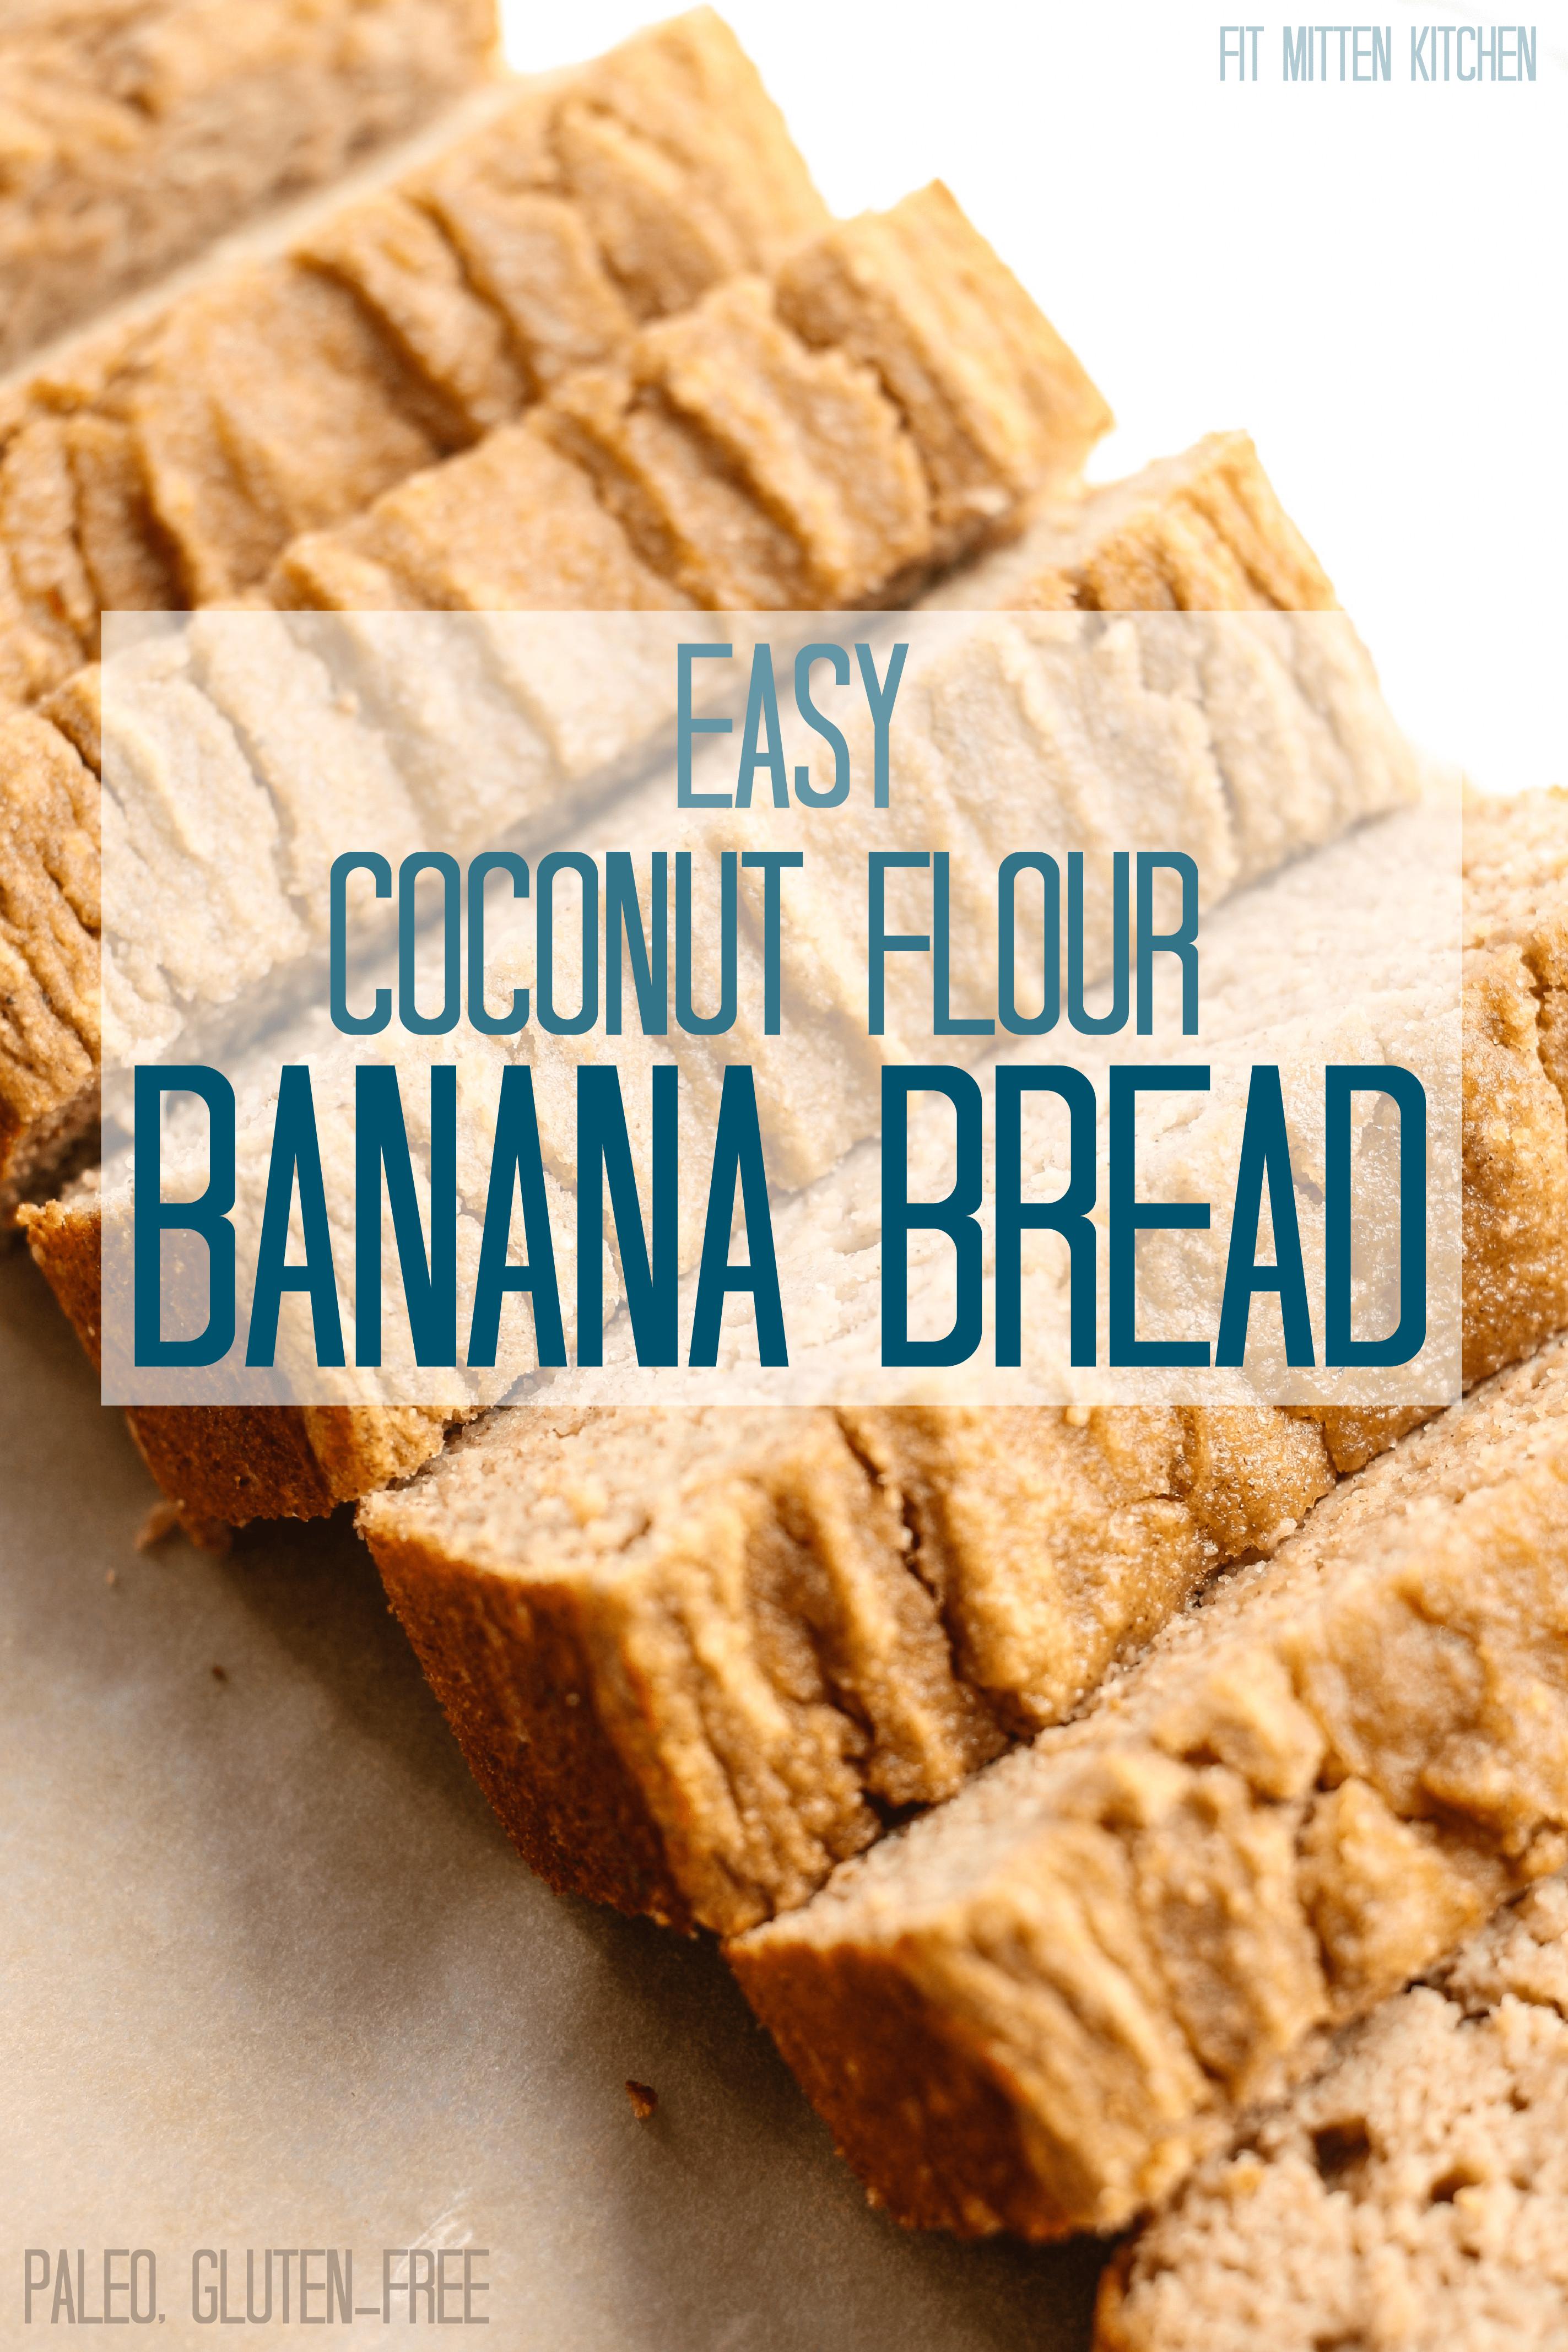 Gluten Free Banana Bread With Coconut Flour  Easy Coconut Flour Banana Bread [paleo gluten free dairy